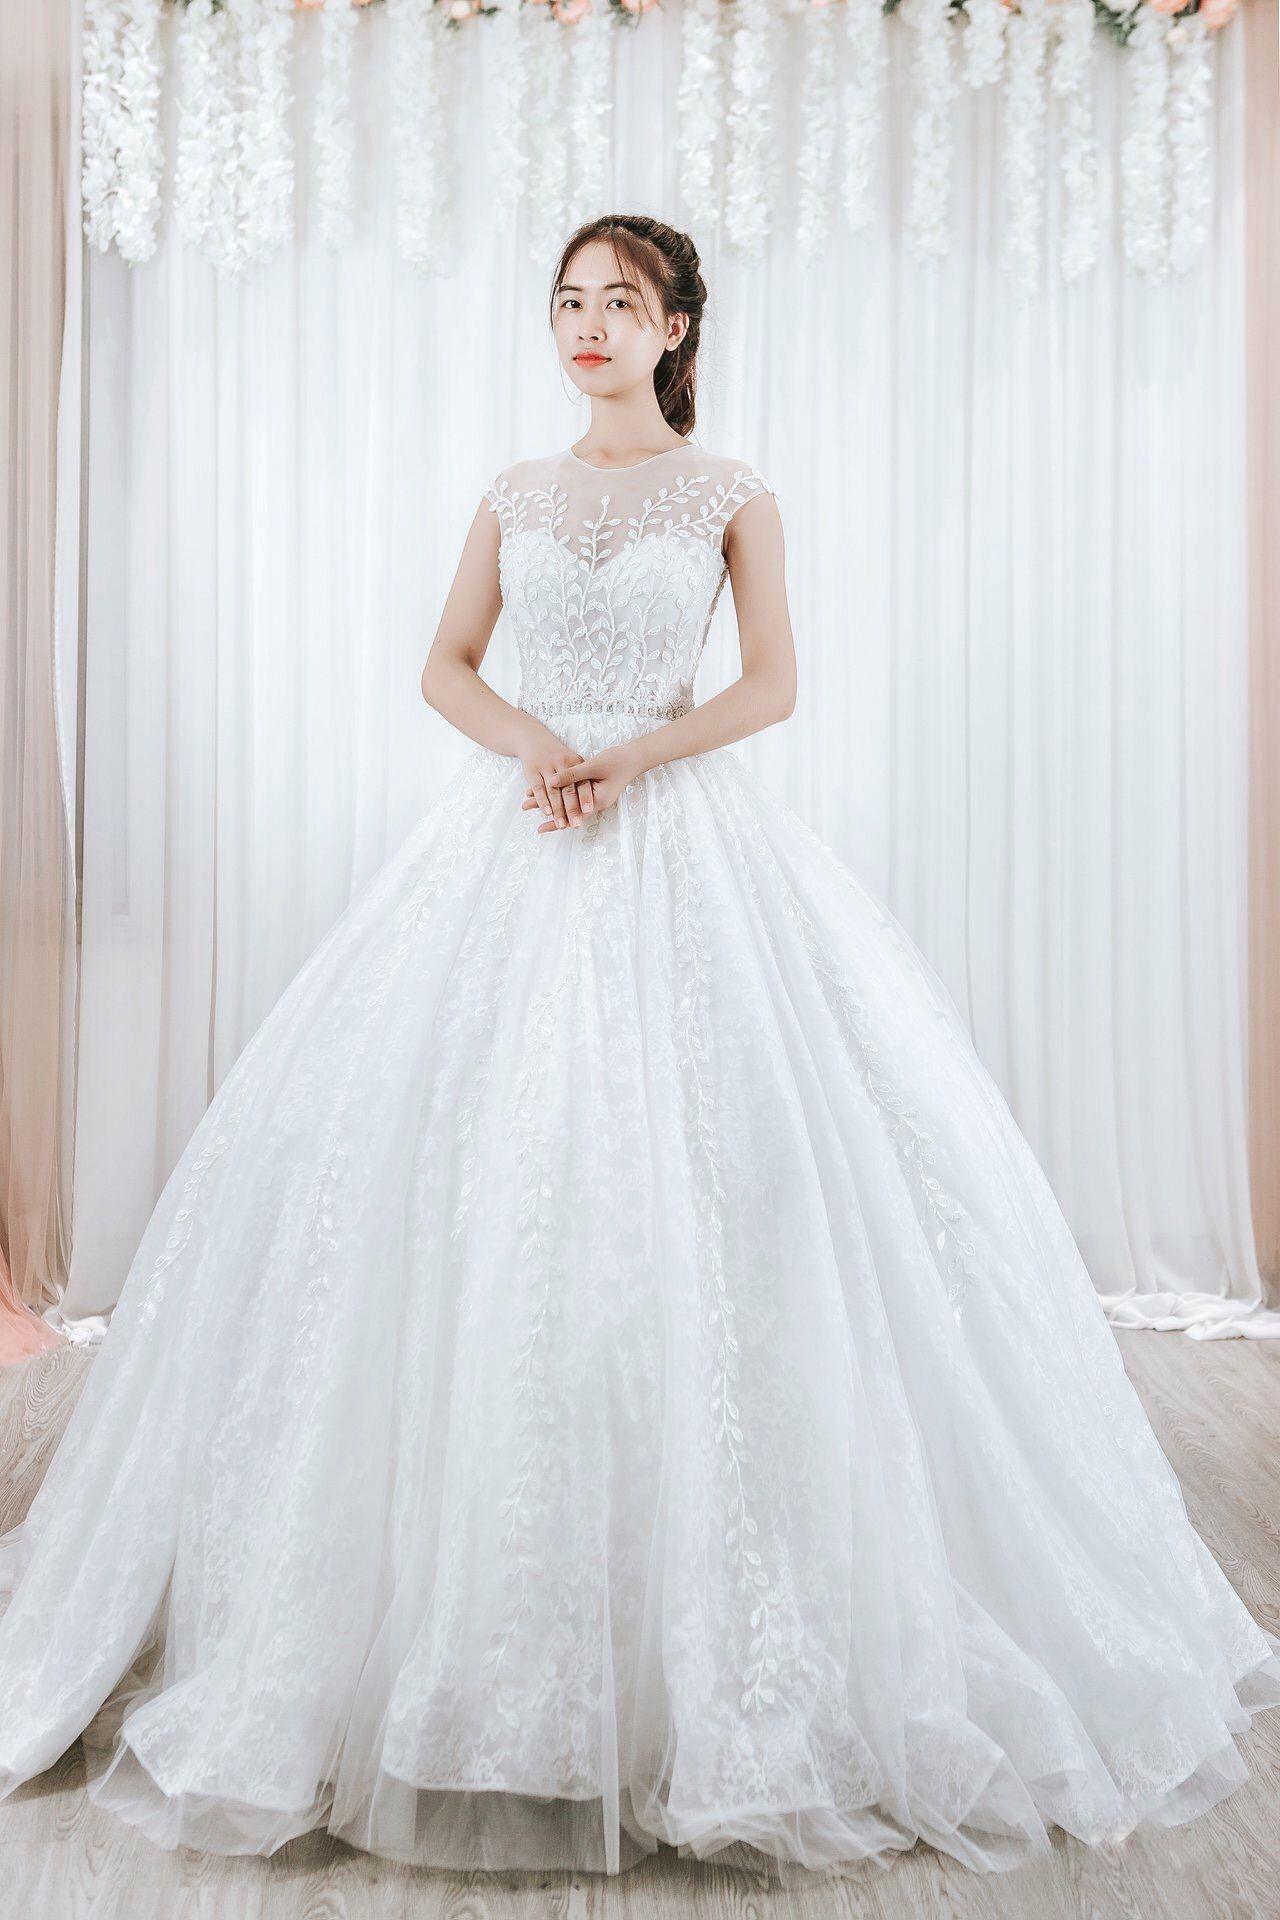 Cap Sleeve Aline Wedding Dress Floral Lace Princess Bridal Gown Vintage Wedding Dress Wedding Dresses Custom Wedding Dress Bridal Gowns Vintage [ 1920 x 1280 Pixel ]